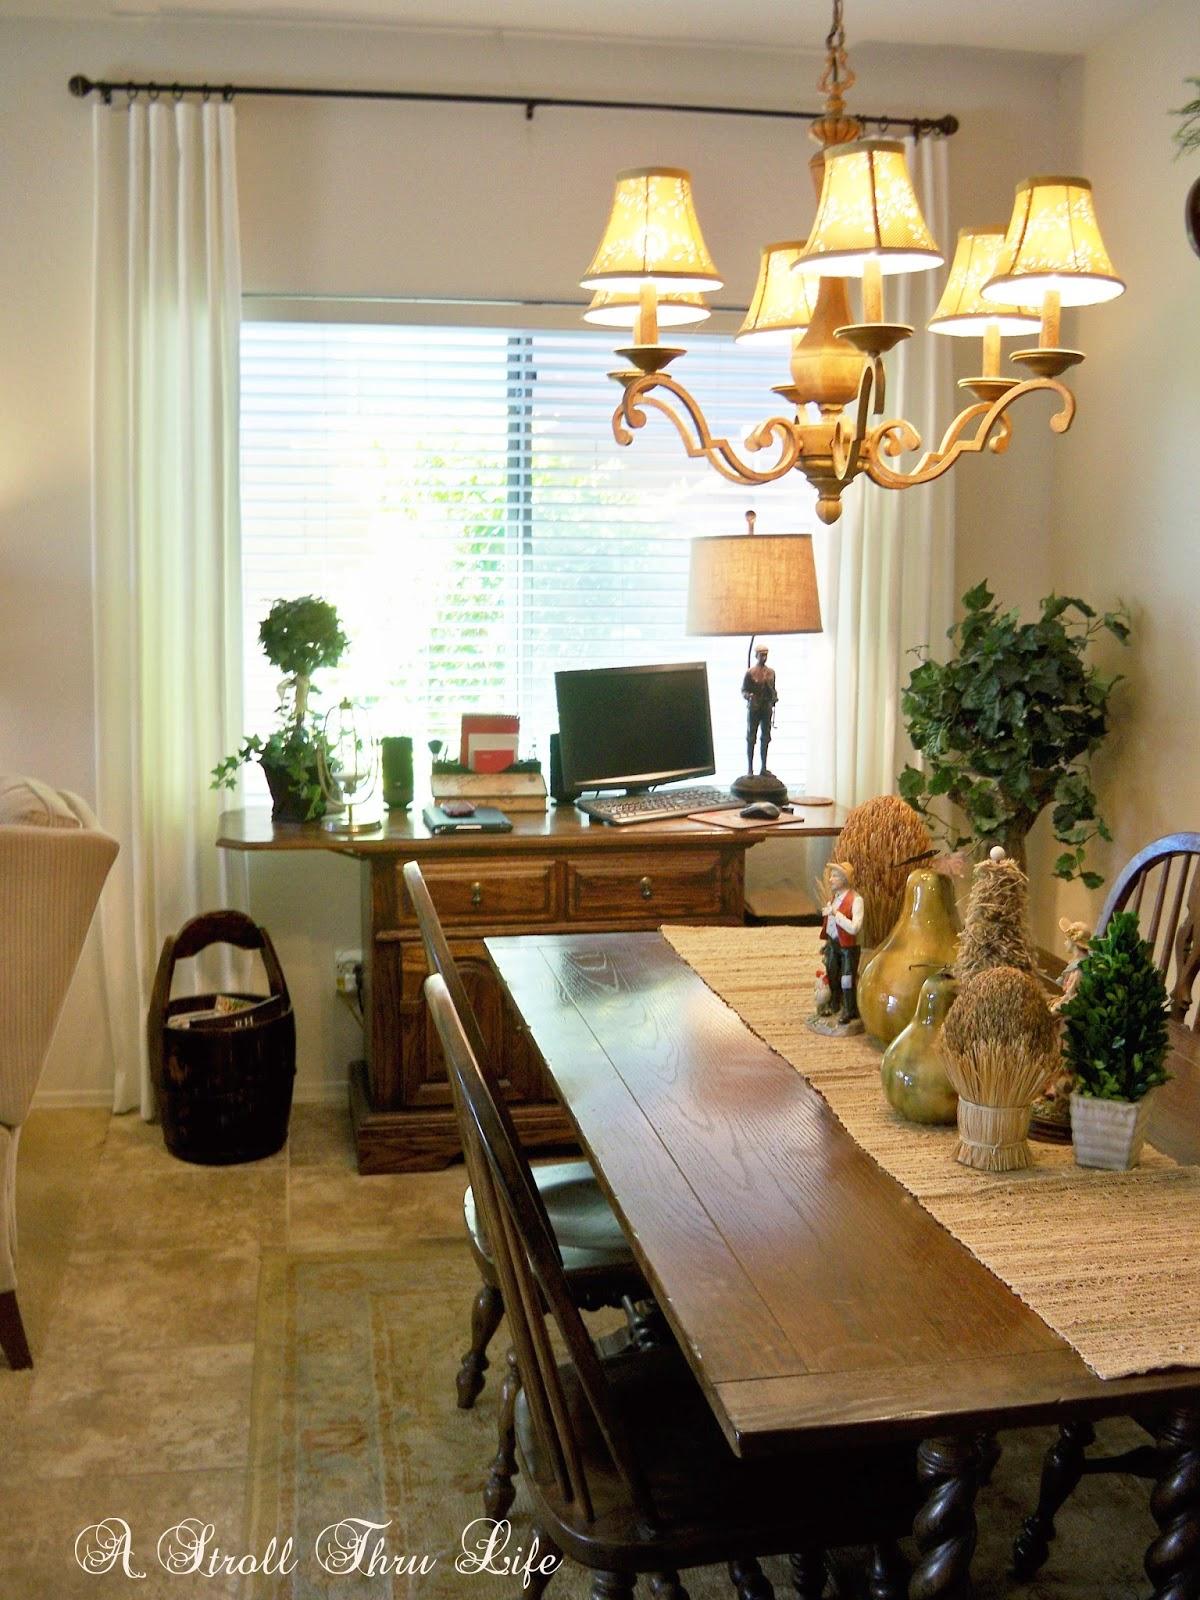 A Stroll Thru Life: Living Room Makeover Plan #2